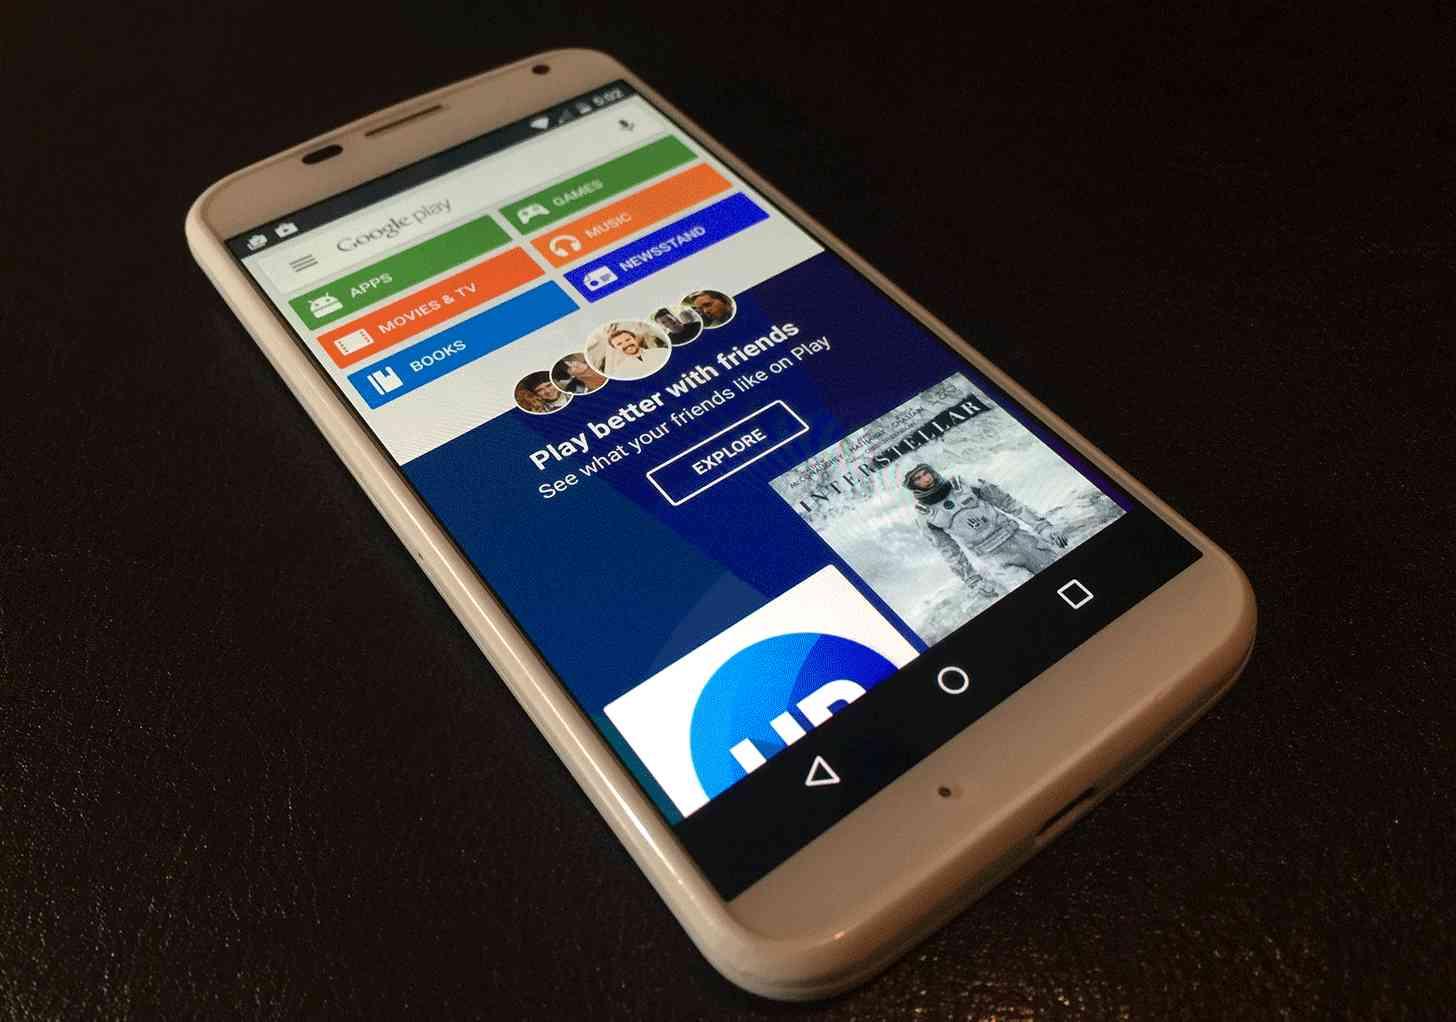 Google Play Store Moto X